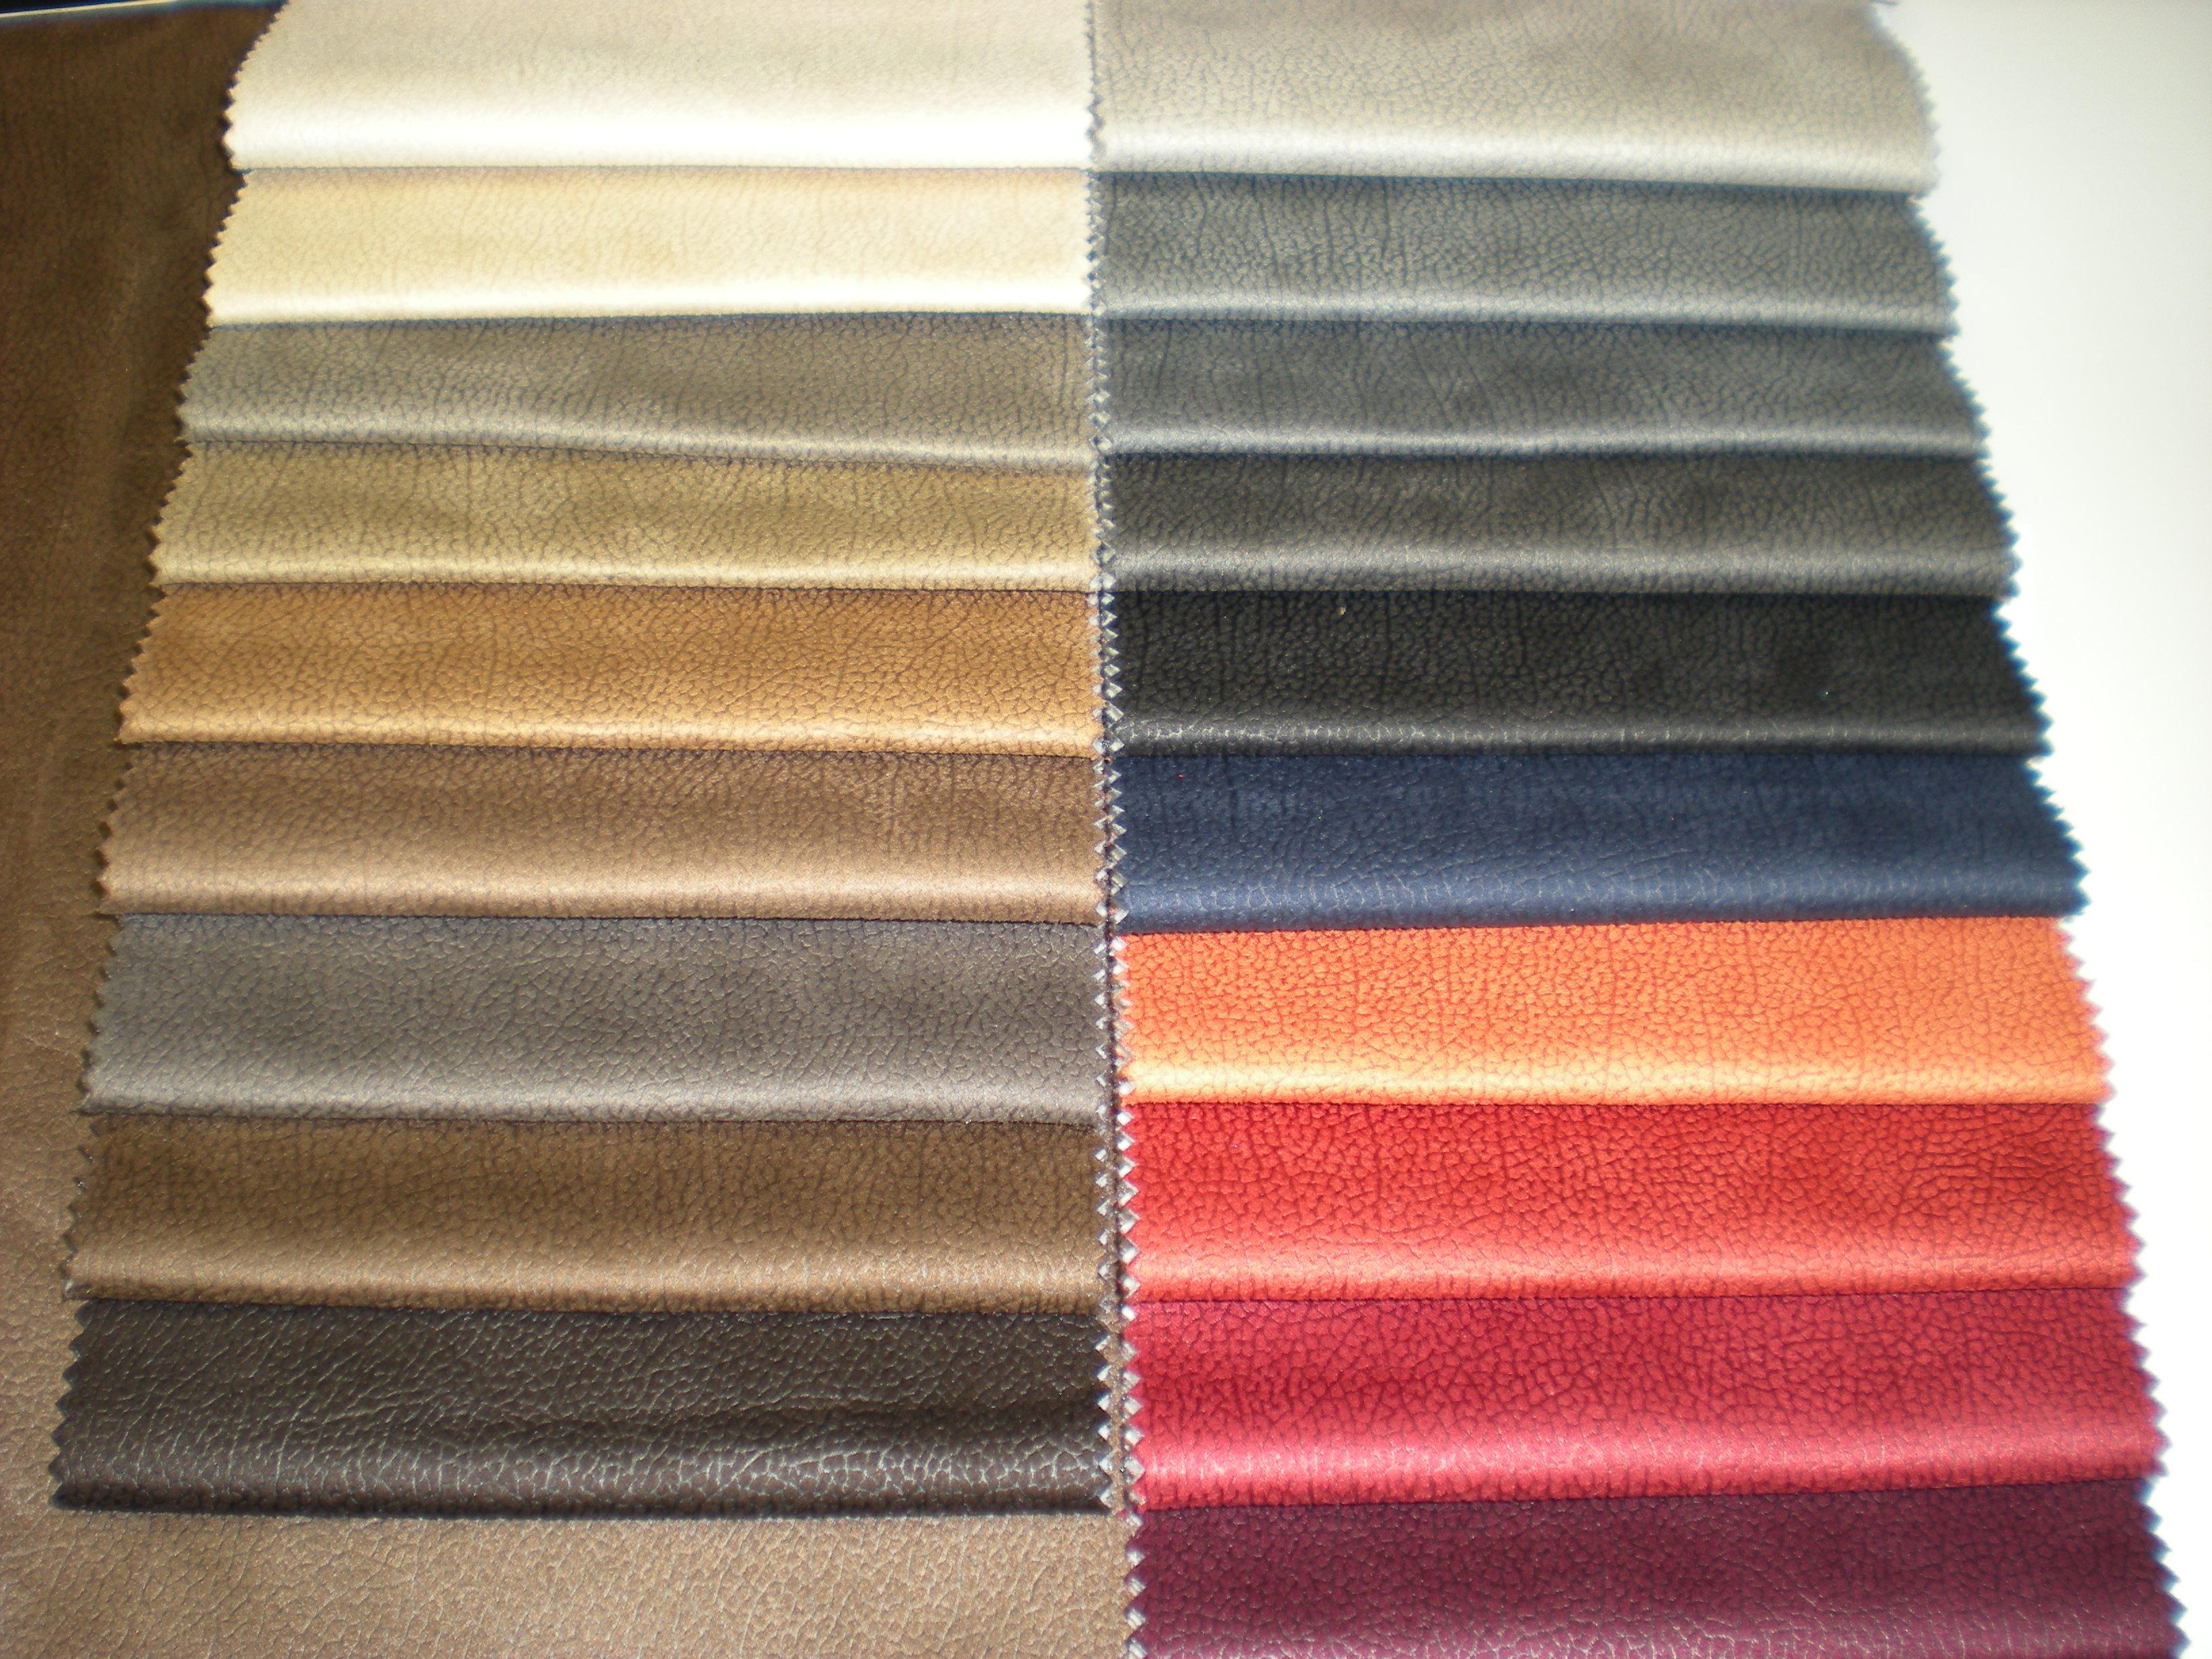 301 moved permanently - Tela tapiceria sofa ...